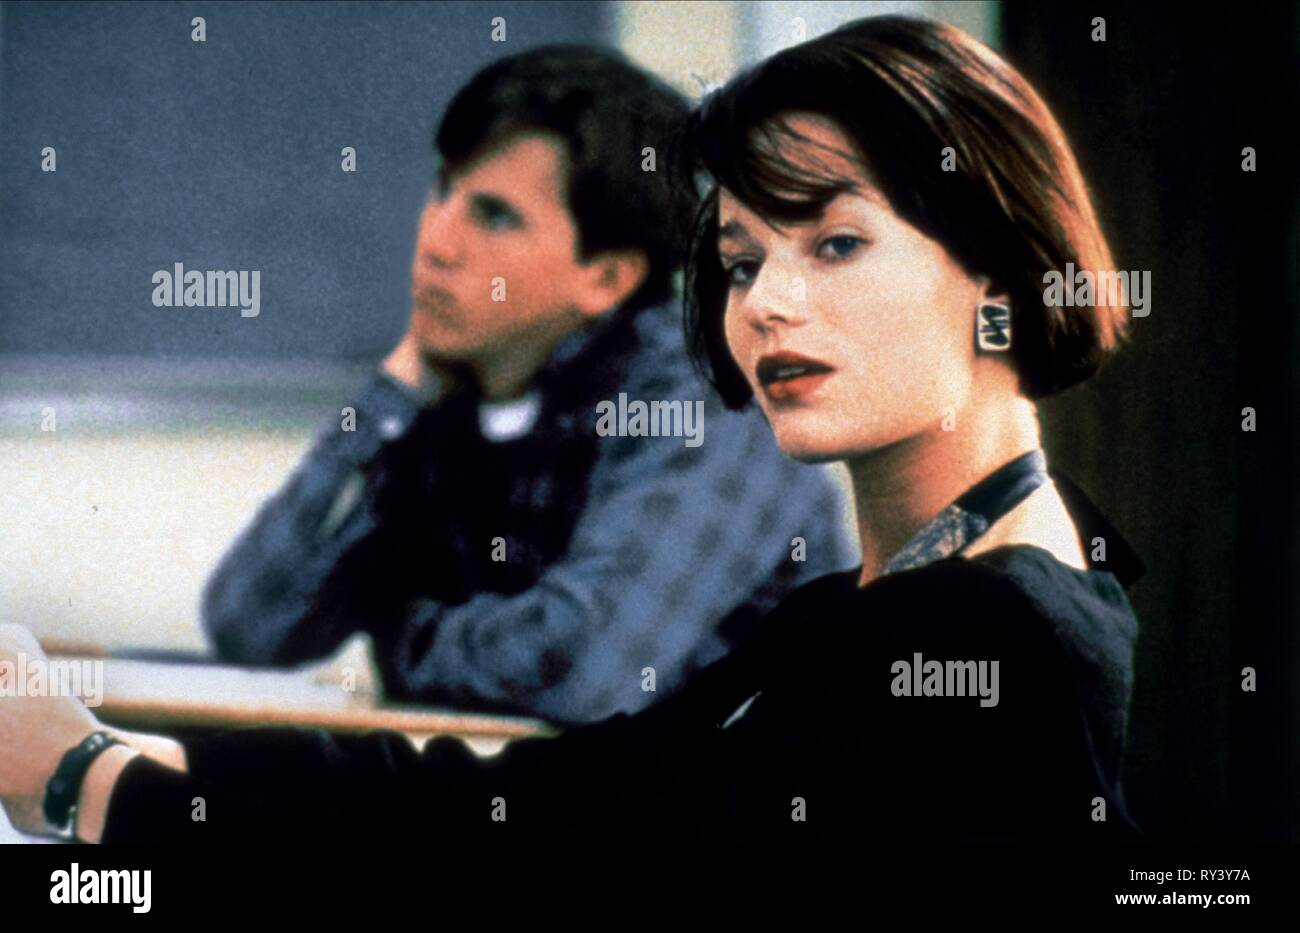 SAMANTHA MATHIS, PUMP UP THE VOLUME, 1990 - Stock Image